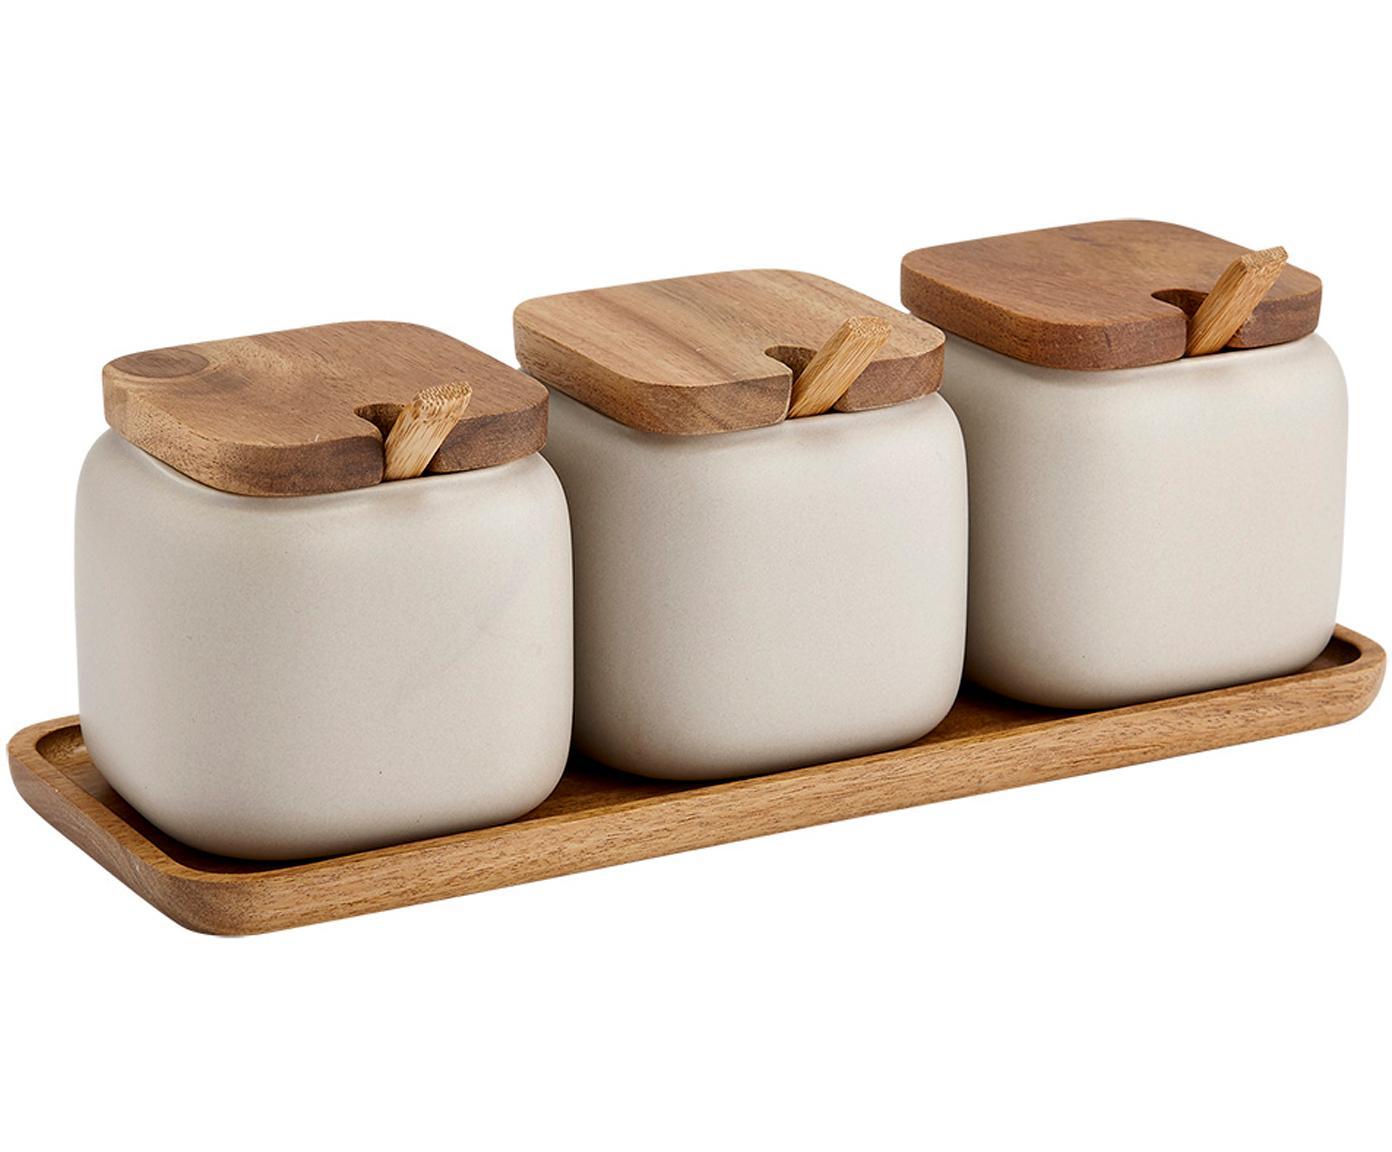 Opbergpotten set Essentials van porselein en acaciahout, 7-delig, Porselein, acaciahout, Zandkleurig, acaciahoutkleurig, 28 x 10 cm